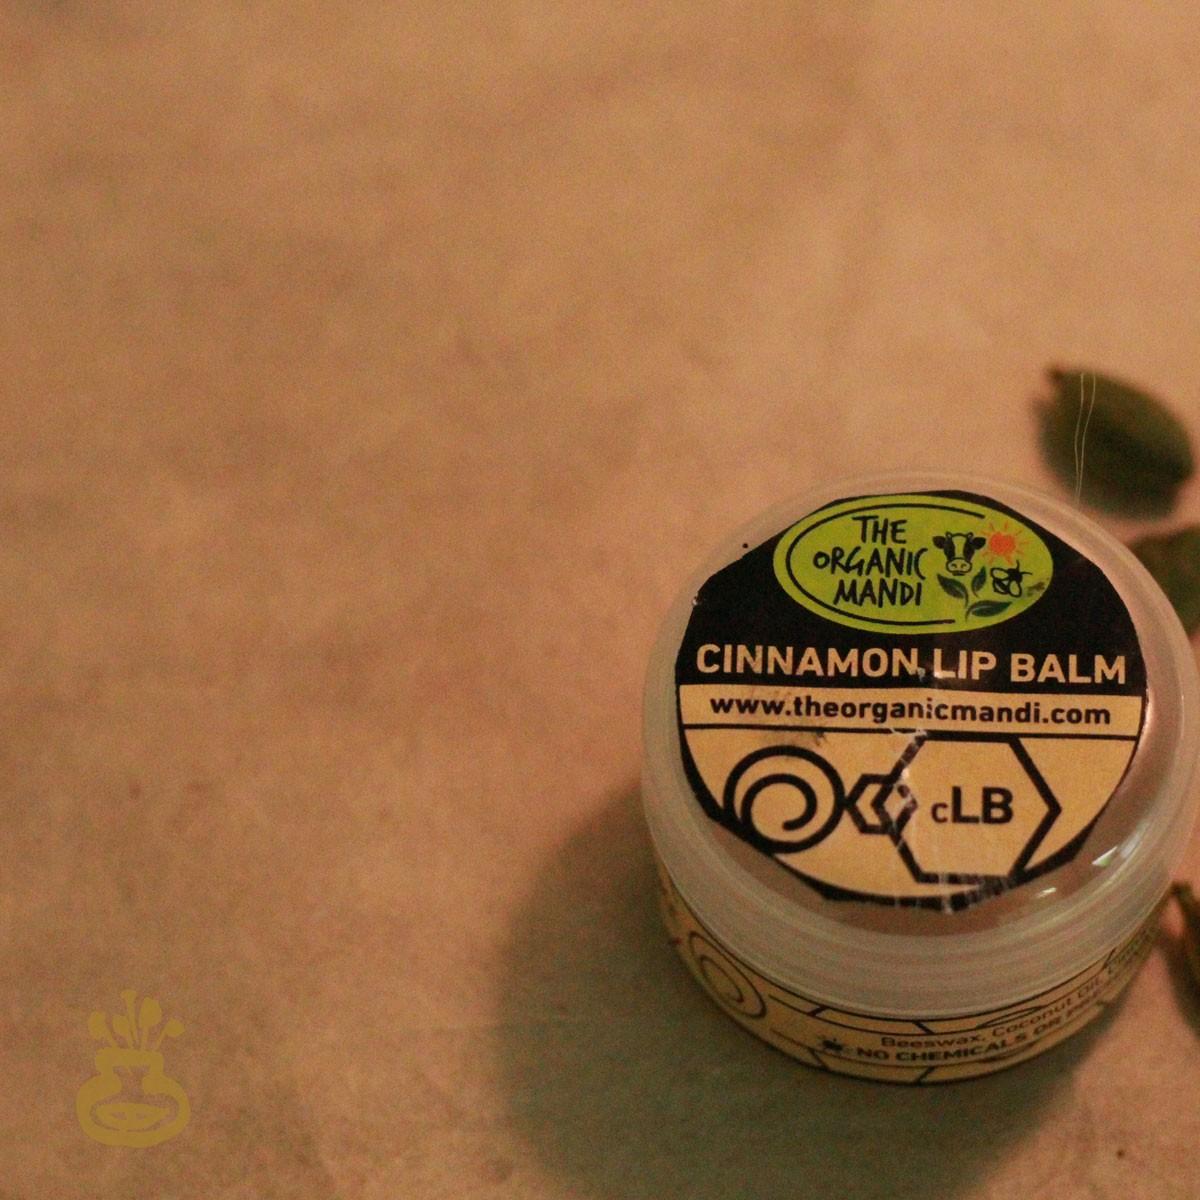 Cinnamon Lip Balm (15g)